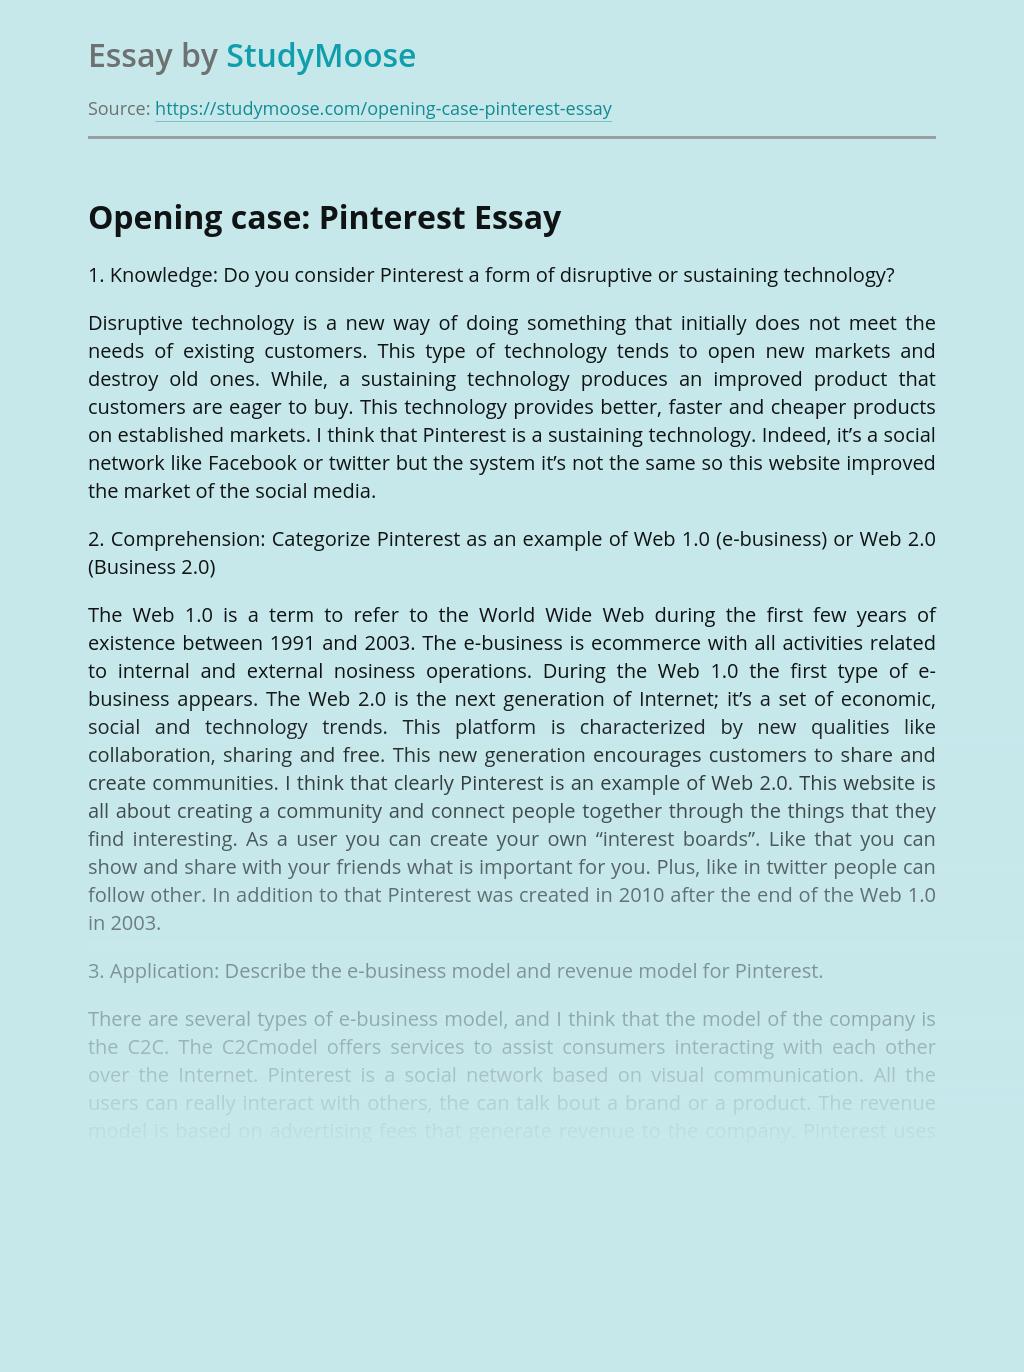 Opening case: Pinterest